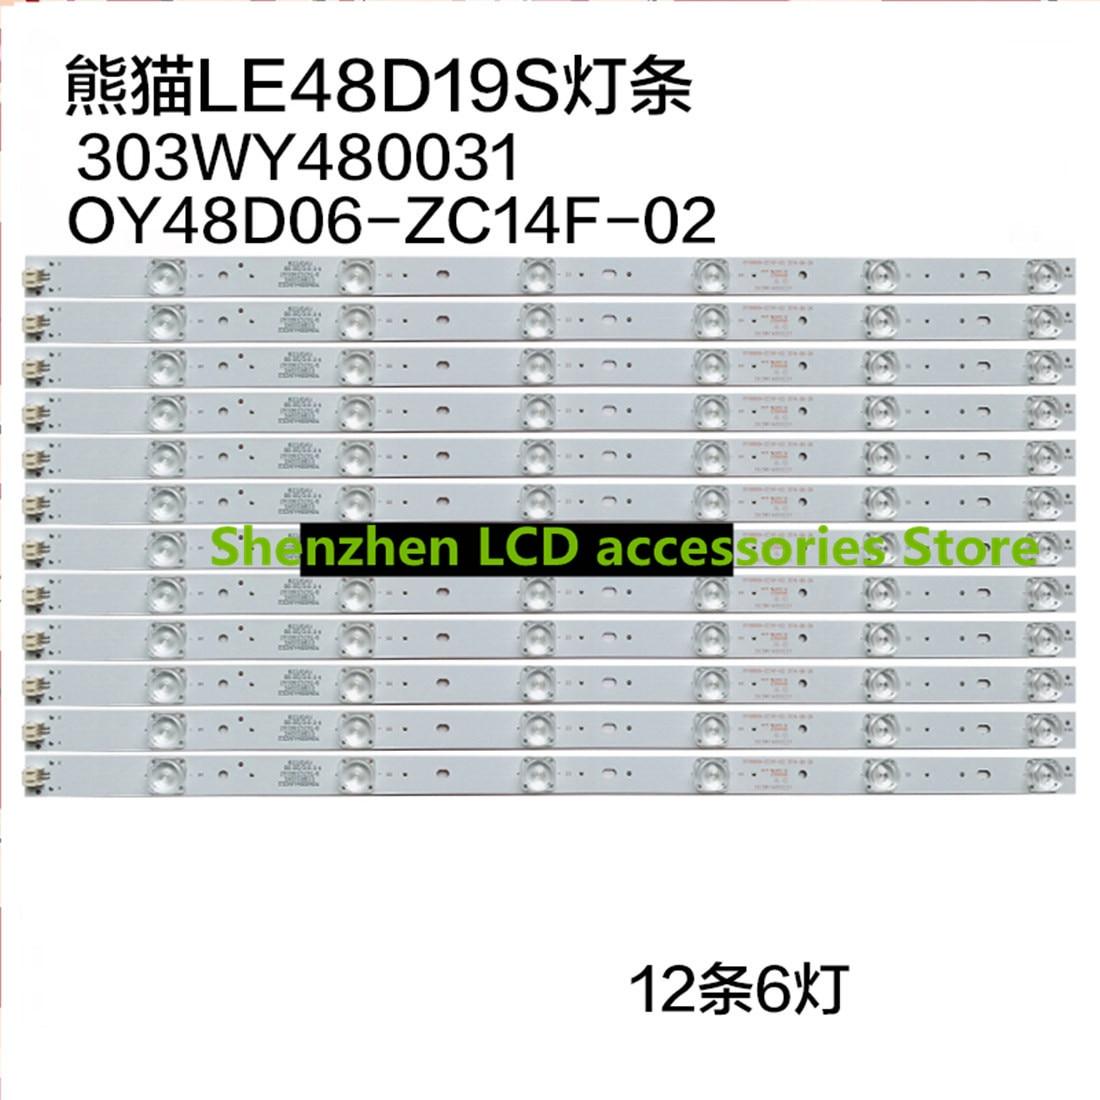 12Pieces/lot    For Panda LE48D19S LCD TV Lamp OY48D06-ZC14F-02 303WY480031  51CM 100%NEW